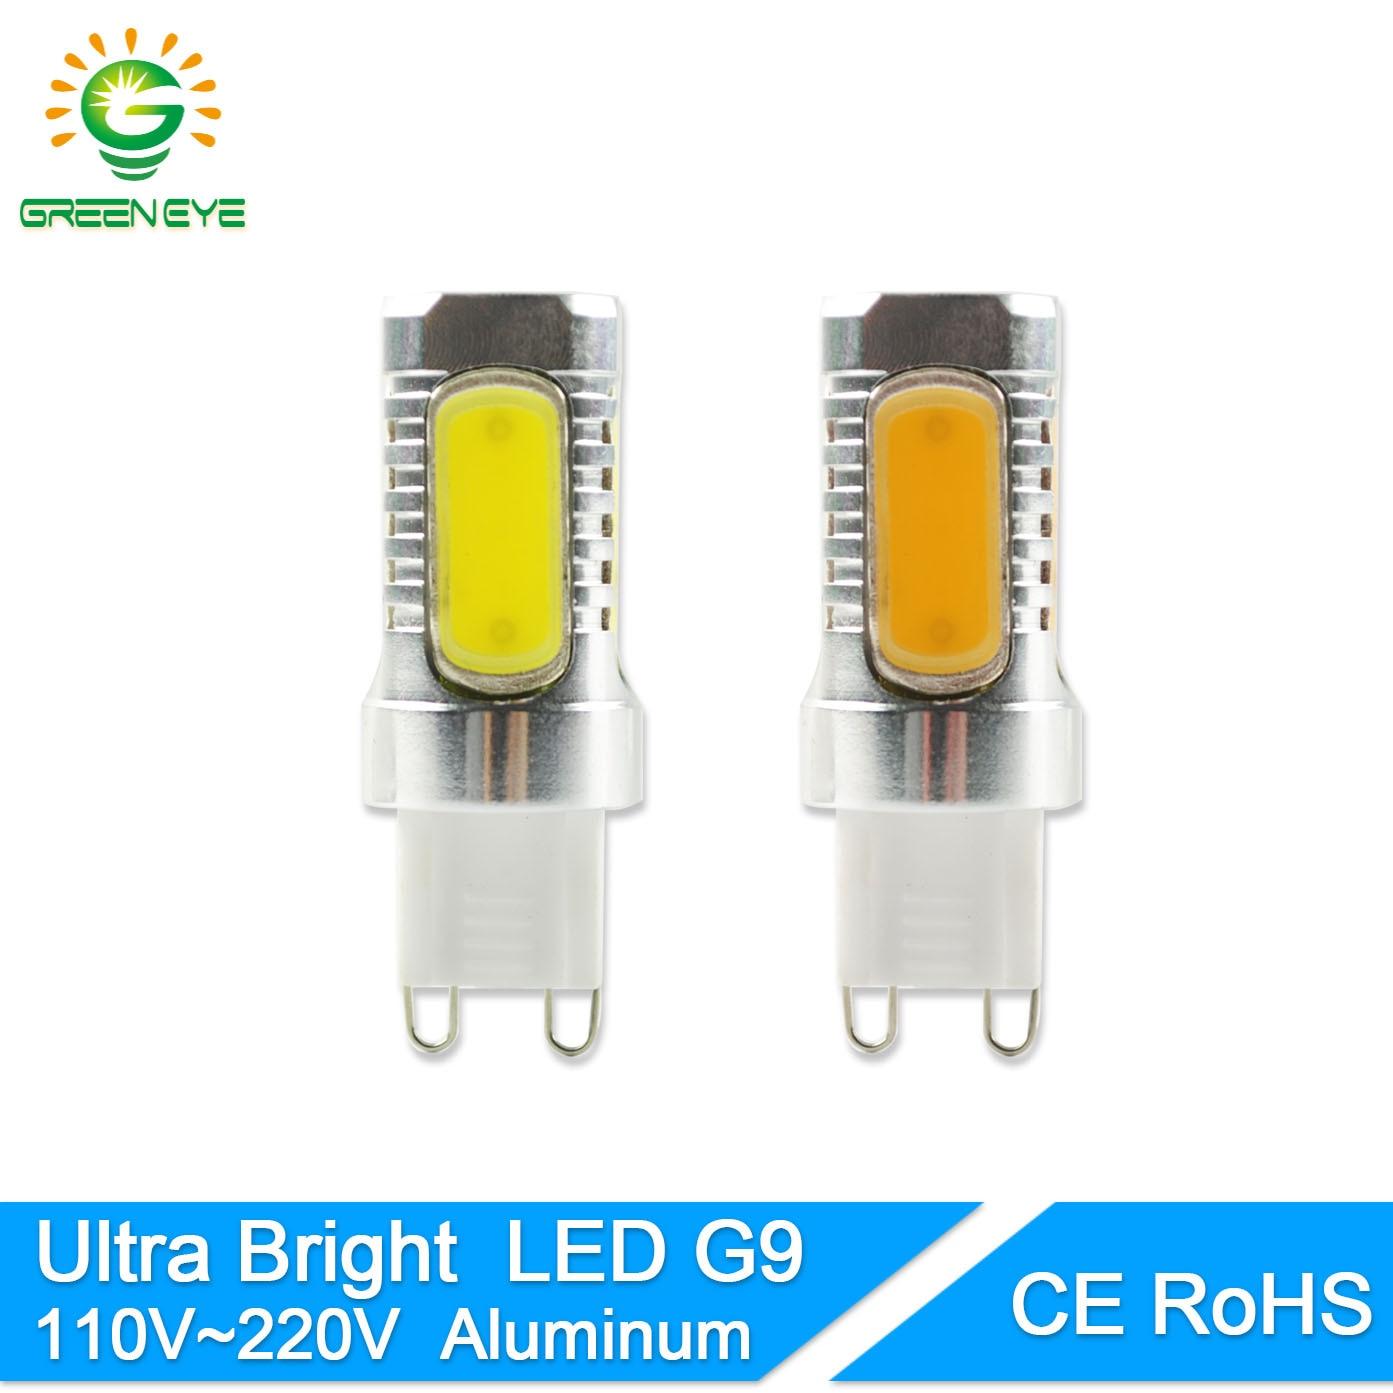 GreenEye-Ultra-Bright-font-b-LED-b-font-Bulb-G9-12W-110V-220V-COB-Light-Lamp Faszinierend R7s Led 118mm Dimmbar Dekorationen